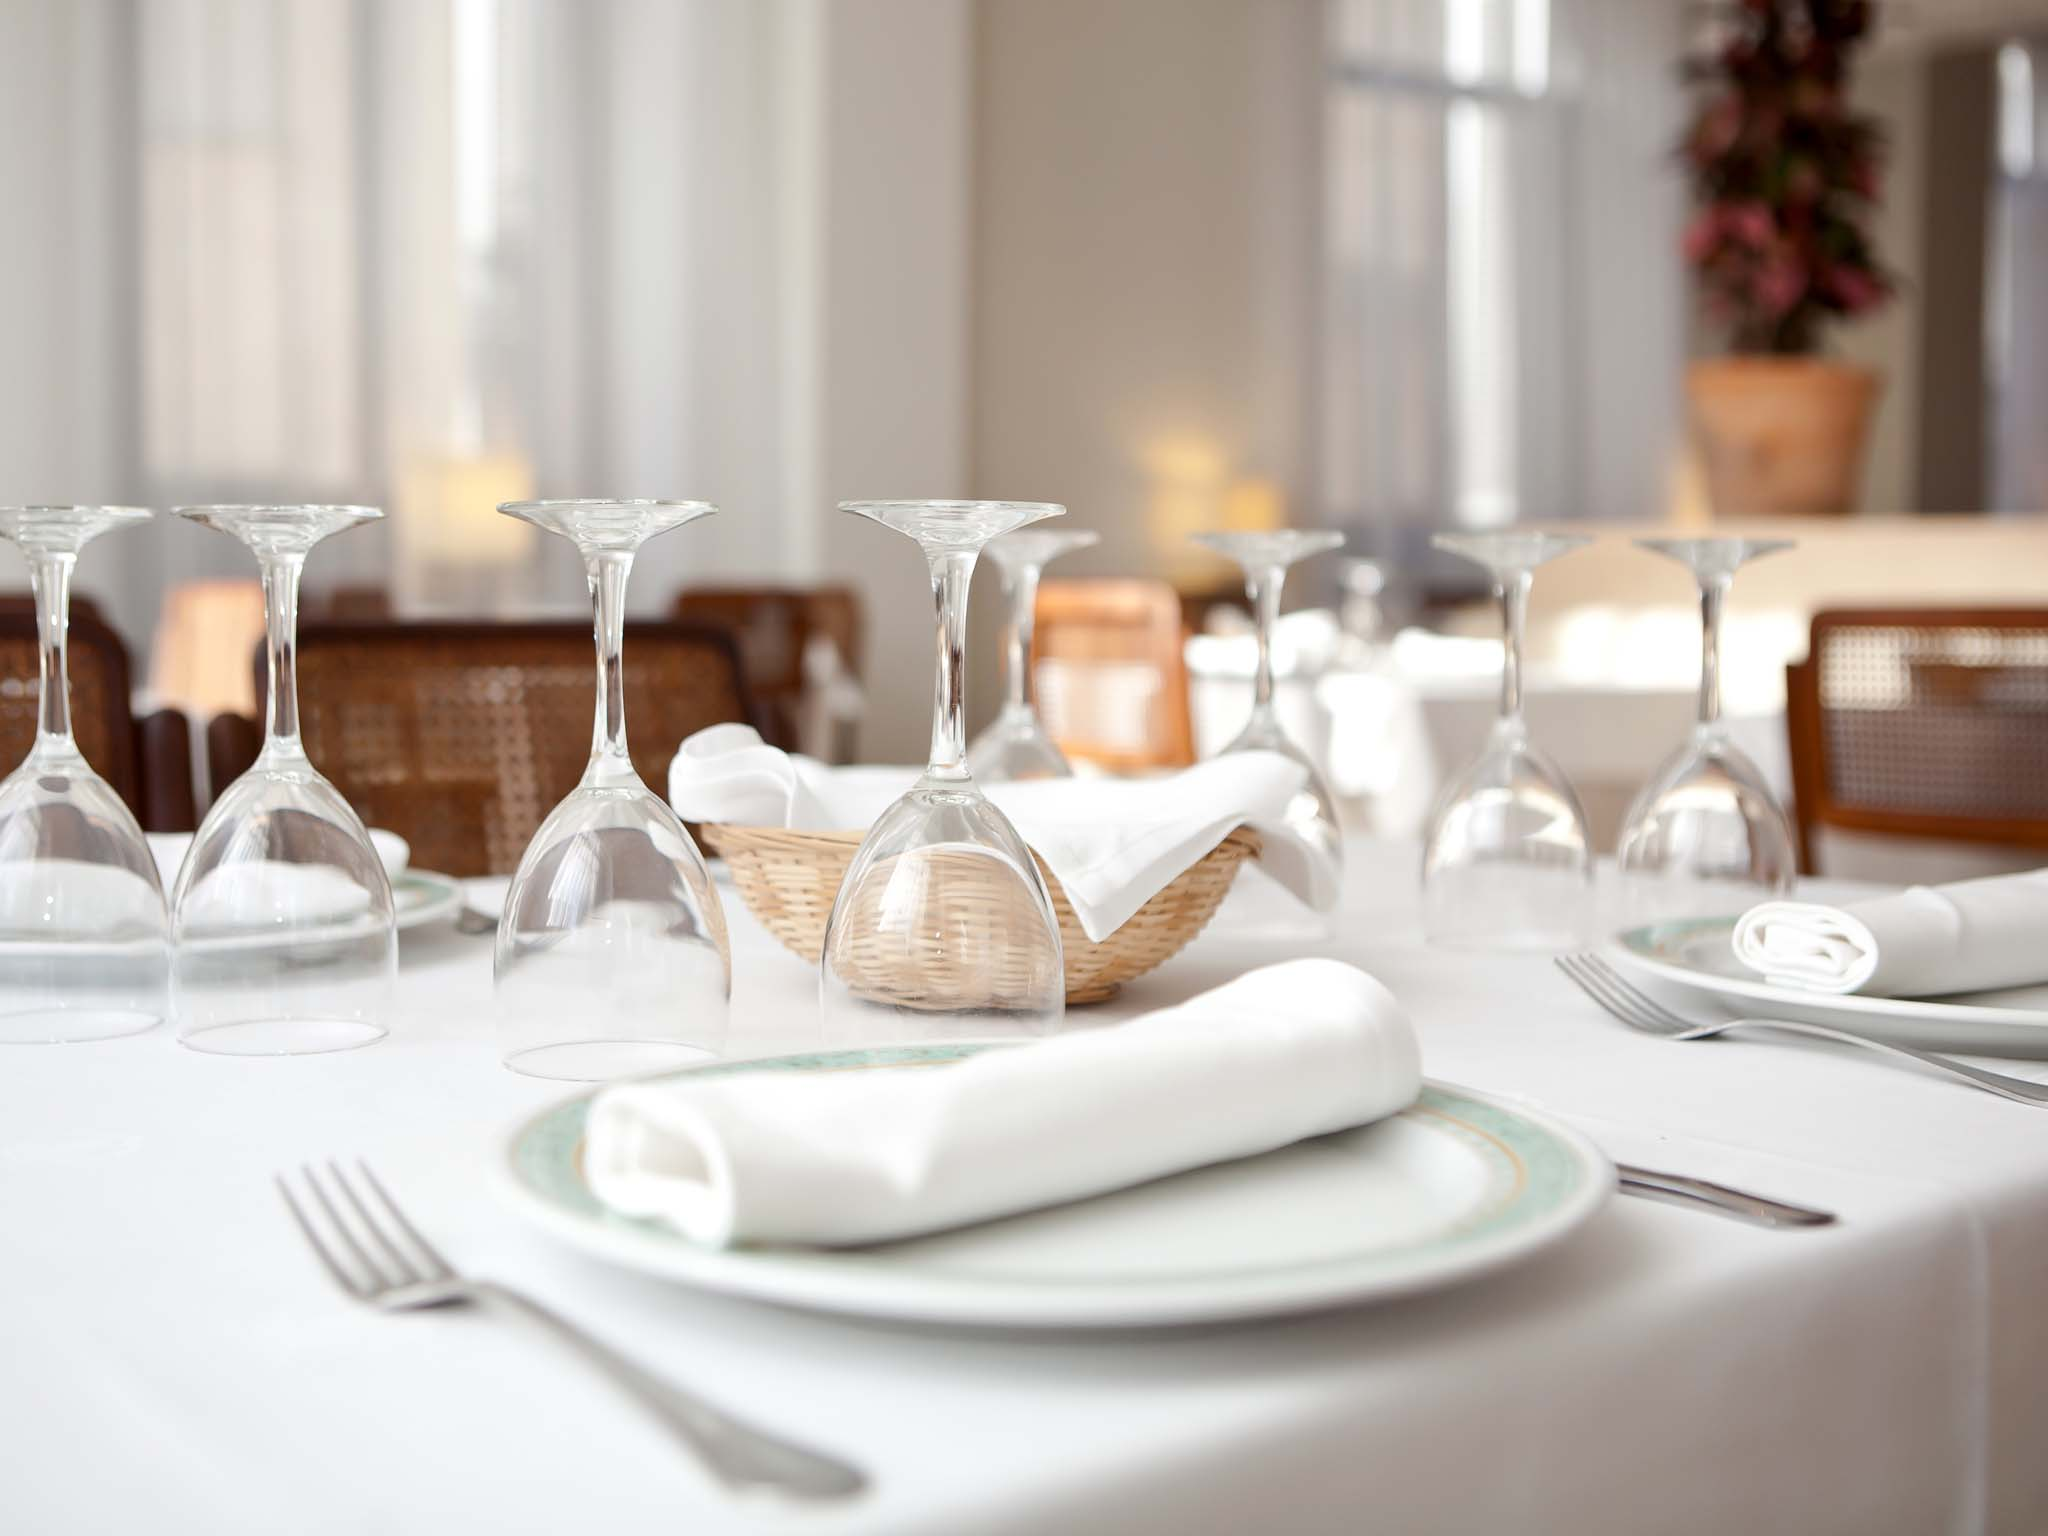 Balneari Prats Restaurant